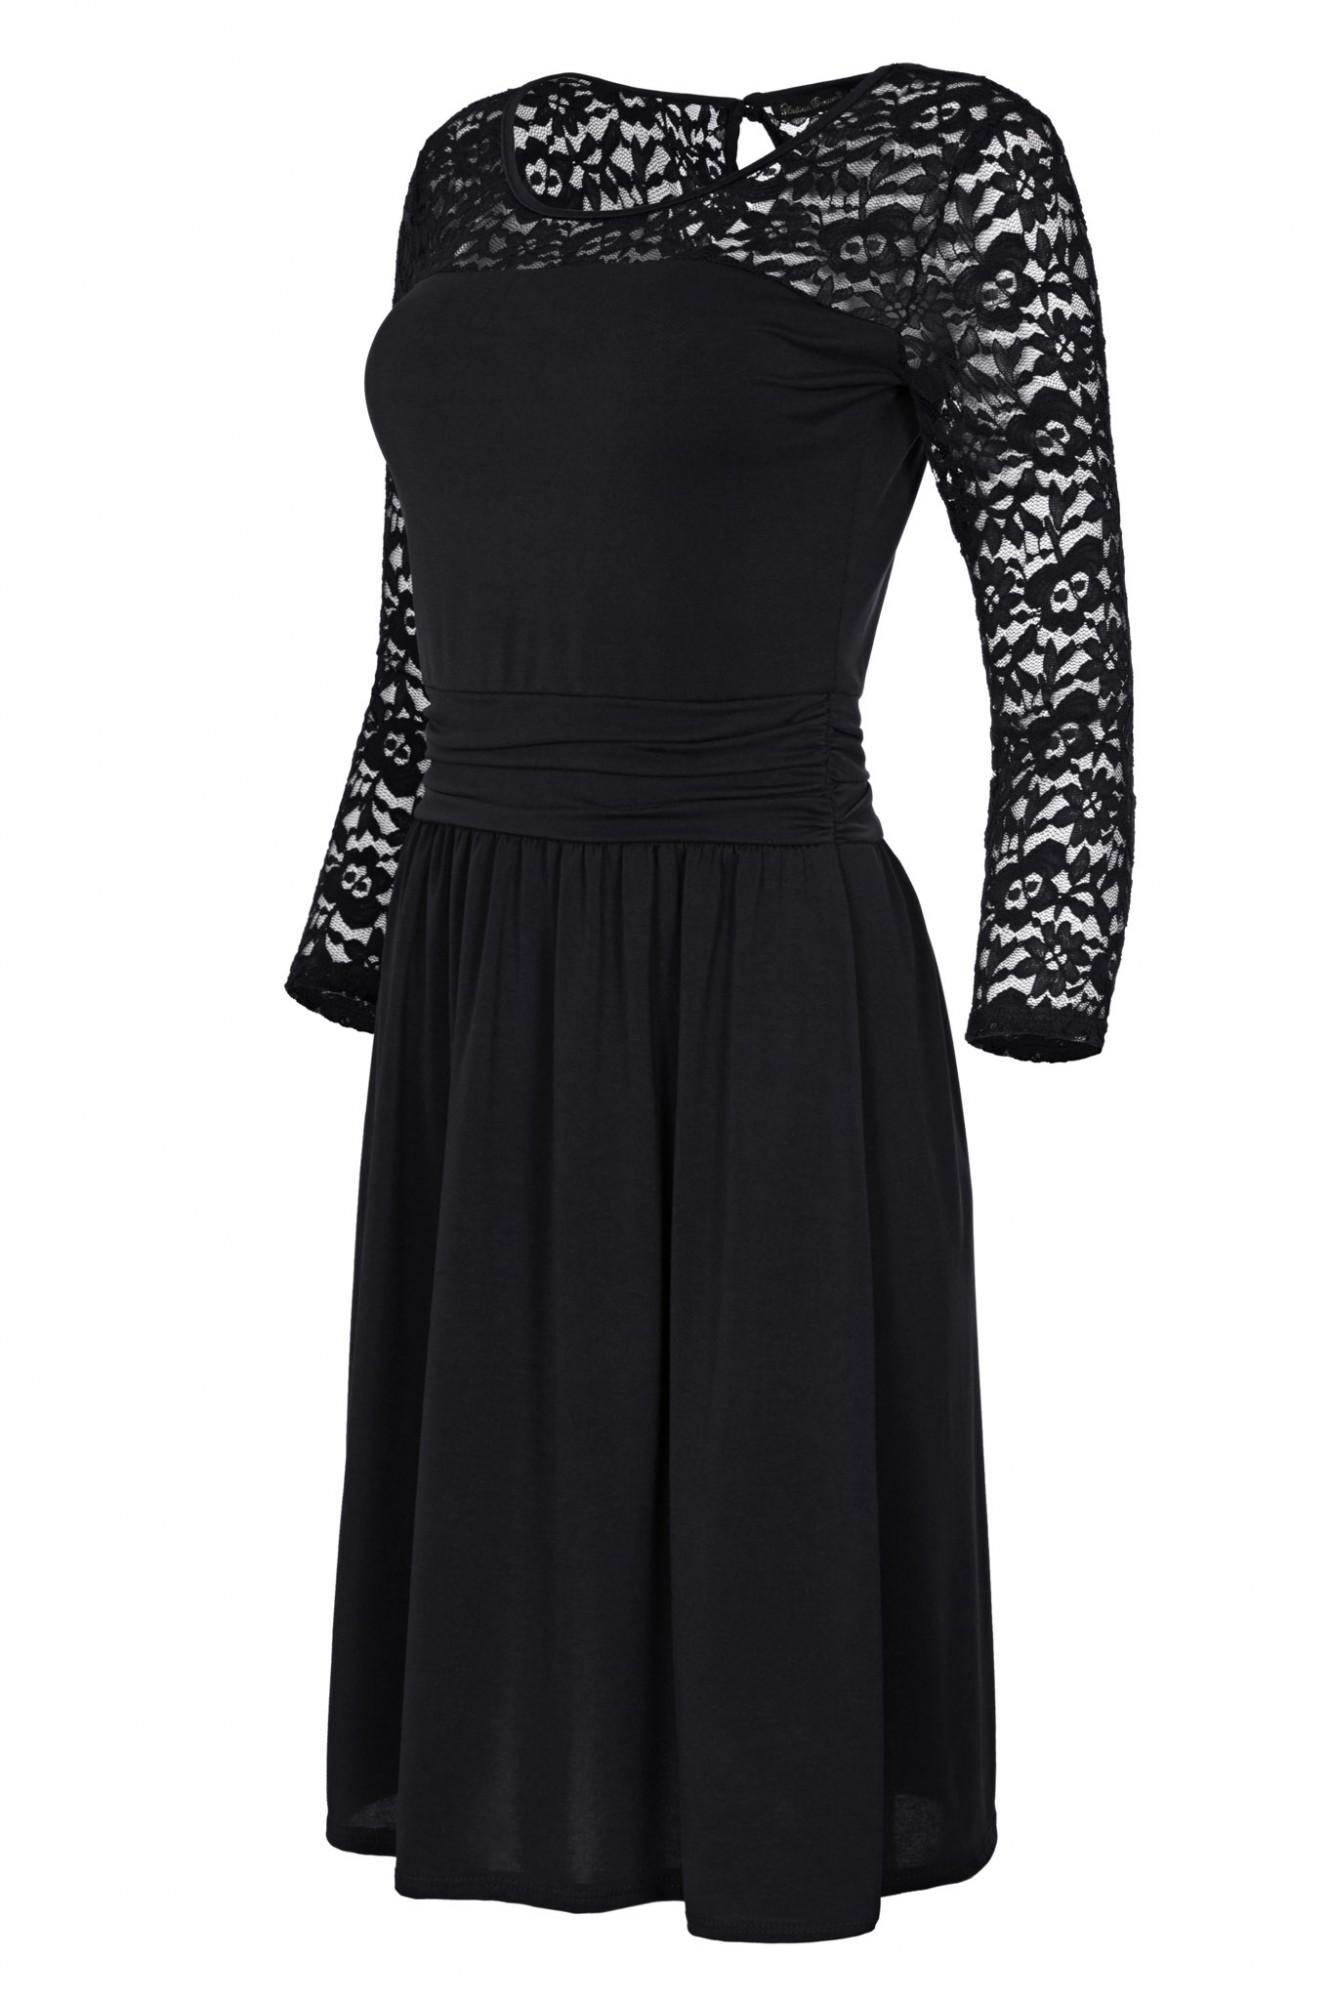 Laeticia Dreams Damen Kleid mit Spitze Knielang Langarm S M L XL